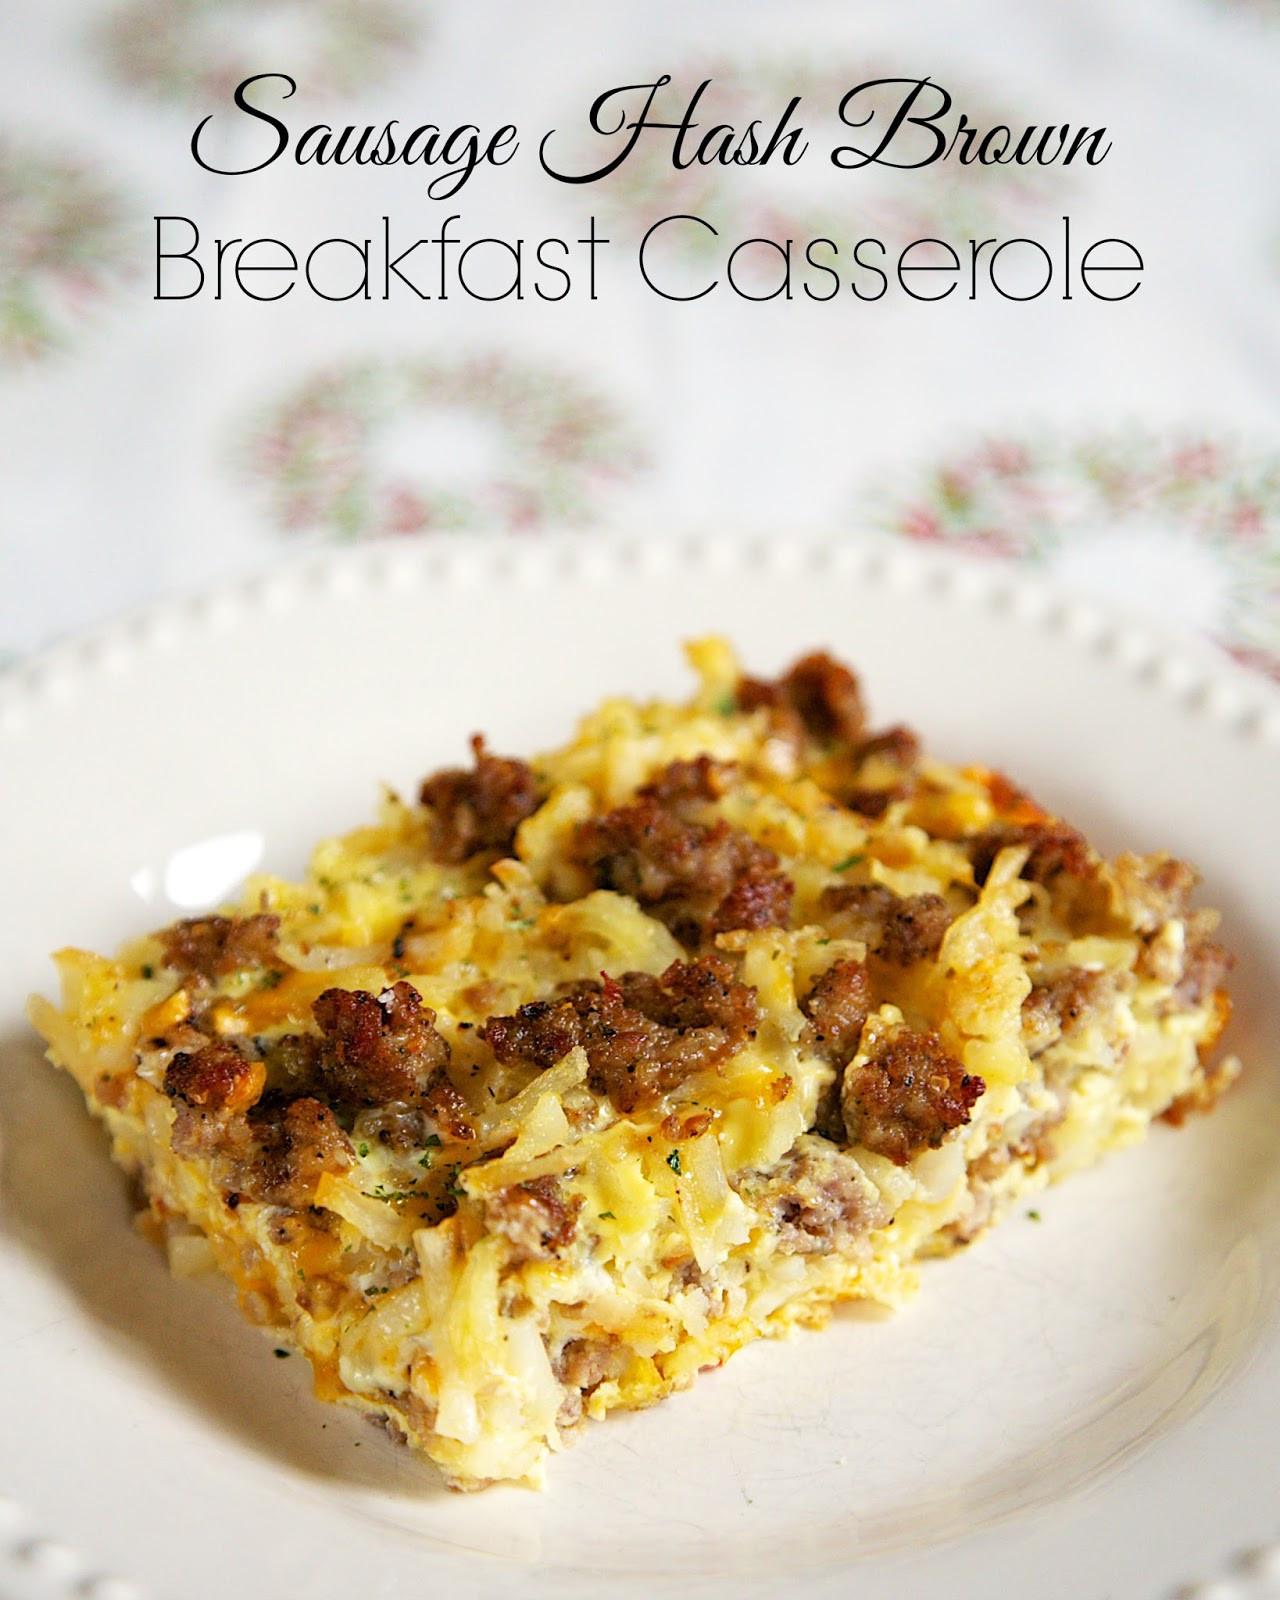 Overnight Breakfast Casserole With Hash Browns And Sausage And Eggs  Sausage Hash Brown Breakfast Casserole